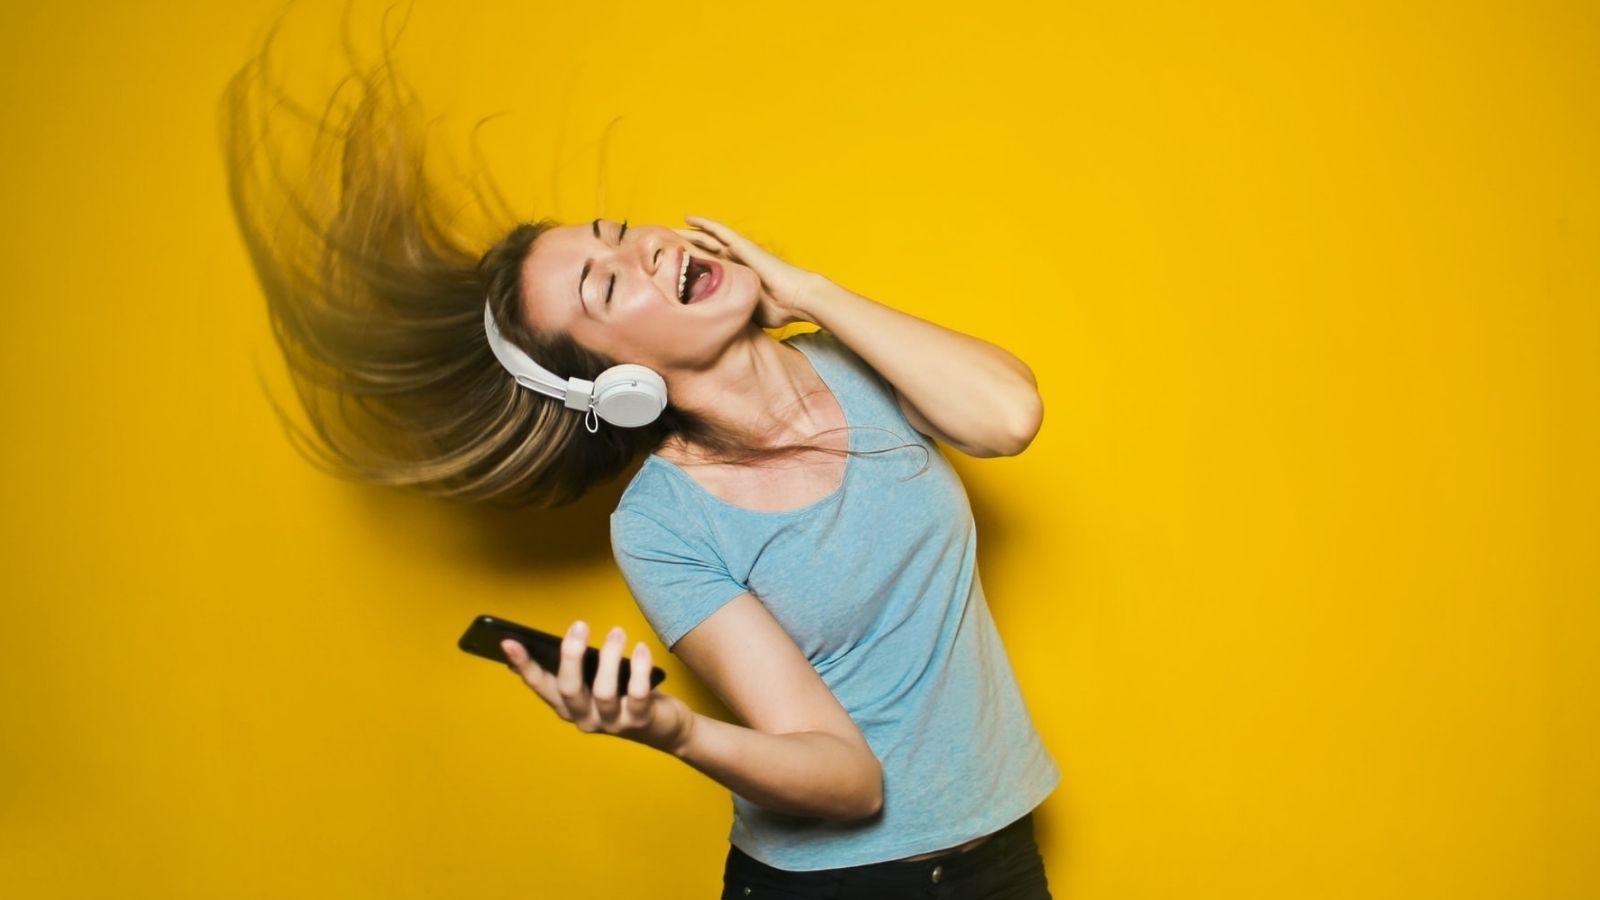 Woman Wearing Headphone